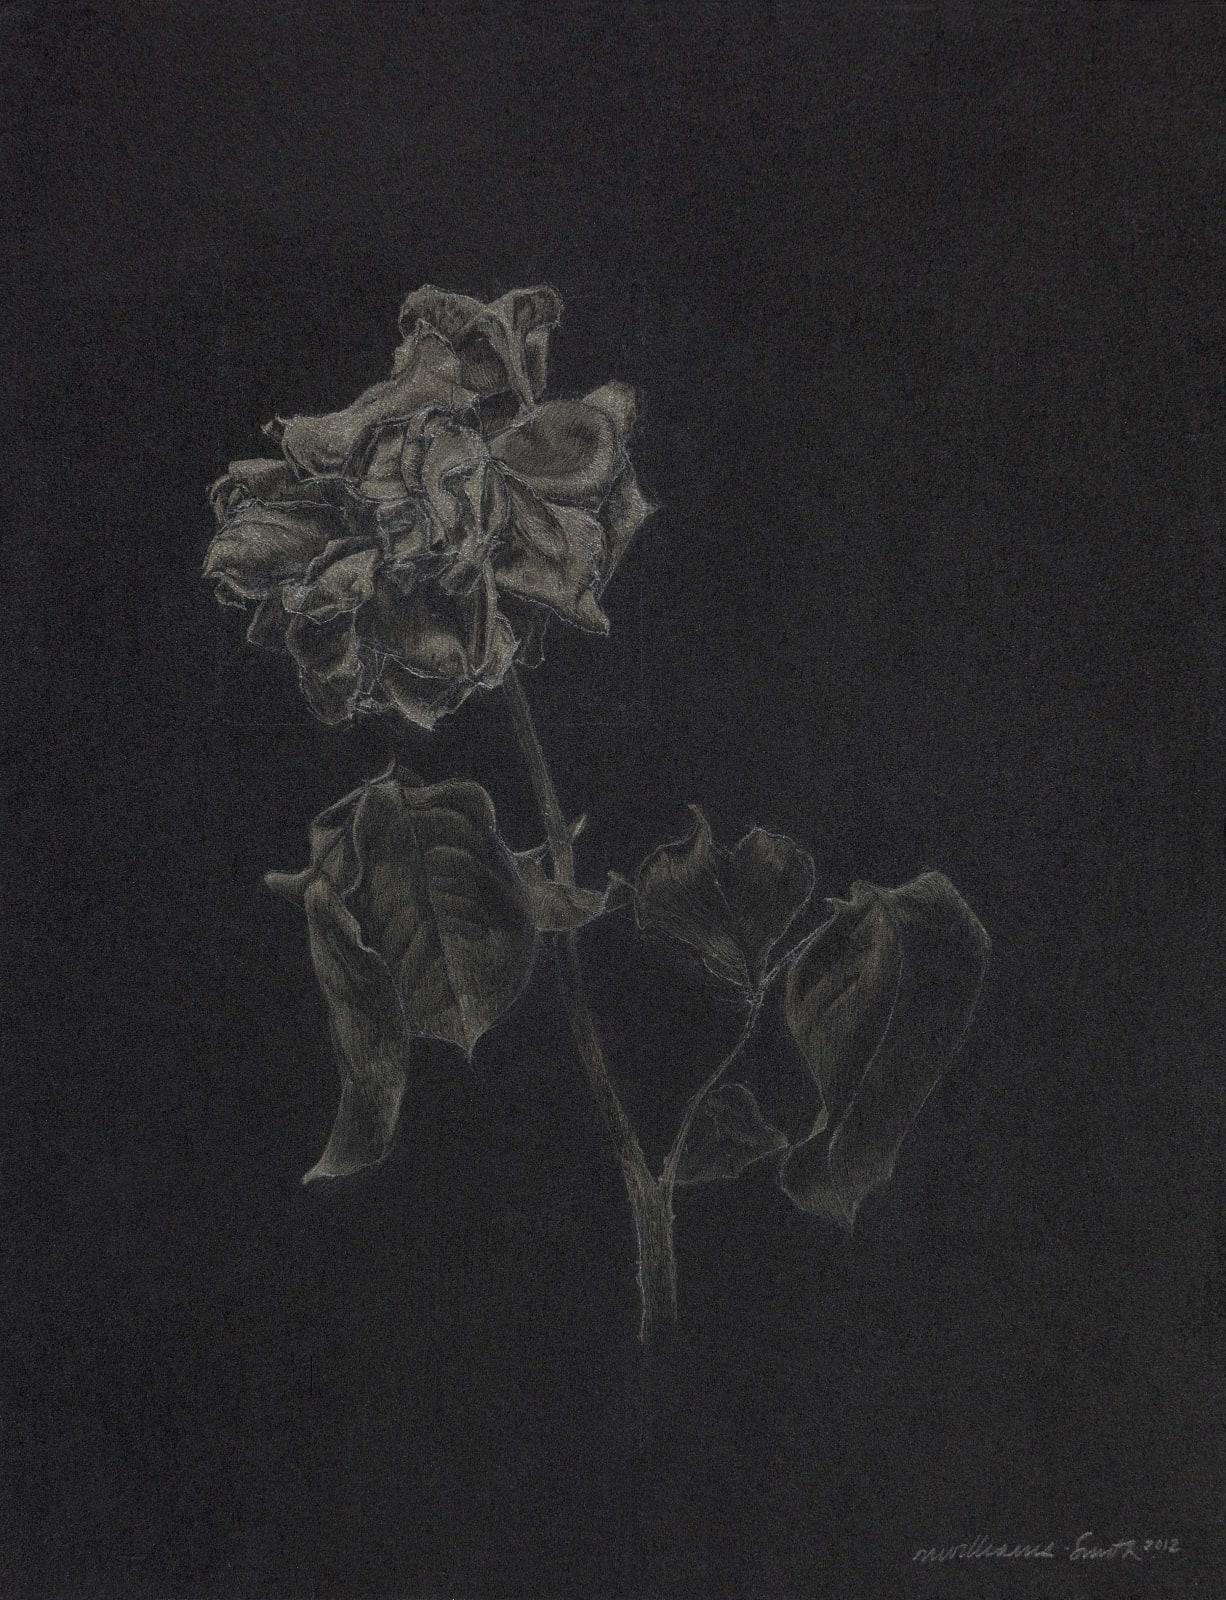 Marjorie Williams-Smith, Glimmer, 2012